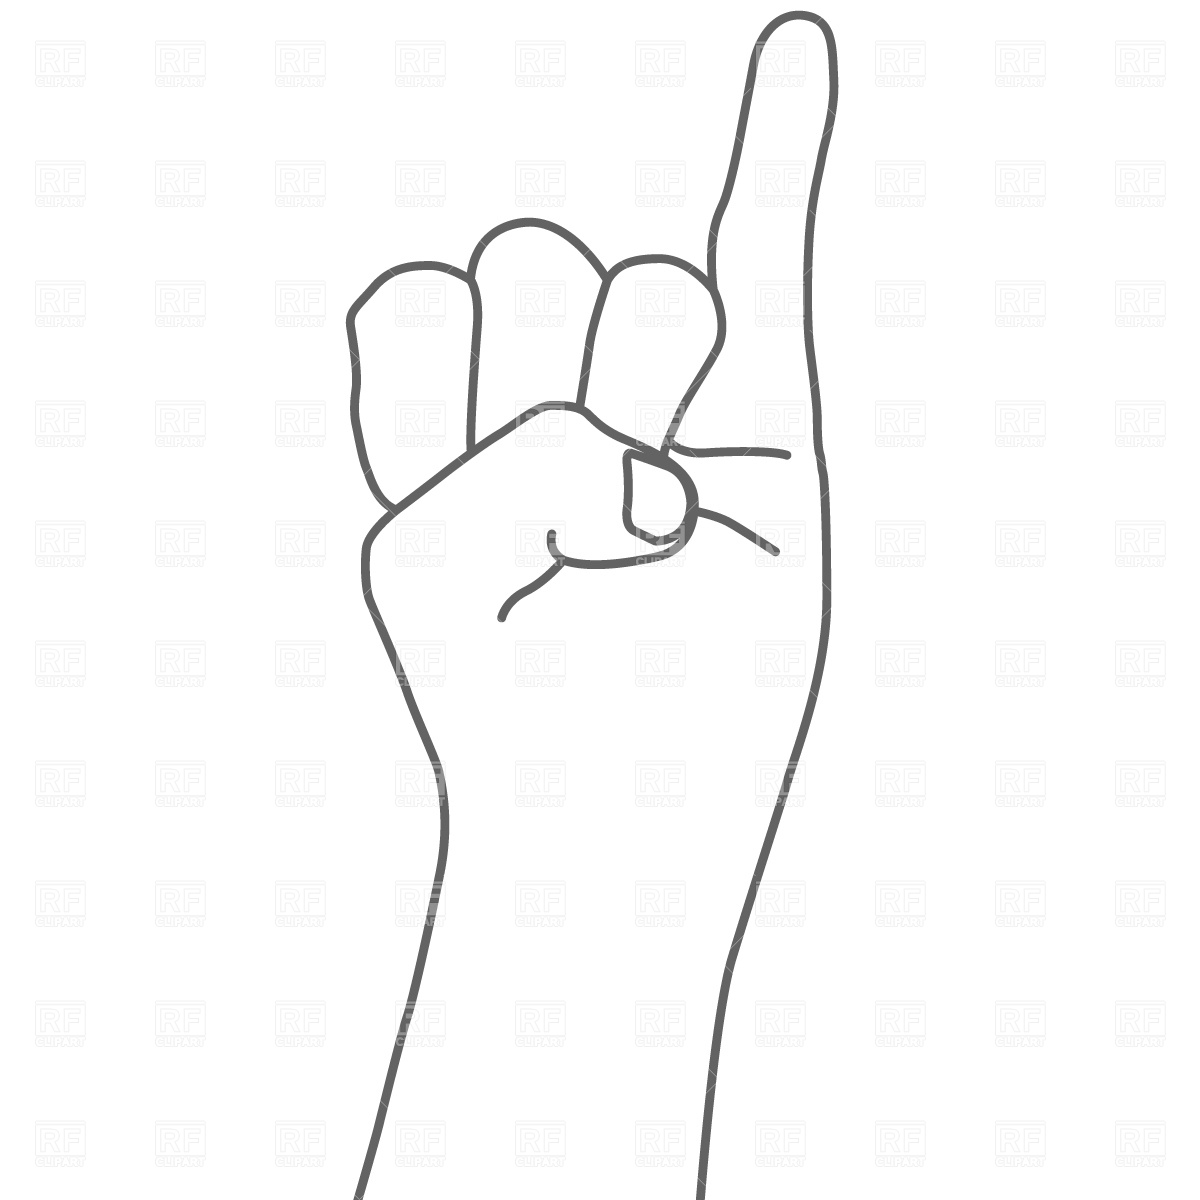 Hertha pointer clipart svg black and white Pointer finger and pinky finger clipart images - ClipartFest svg black and white